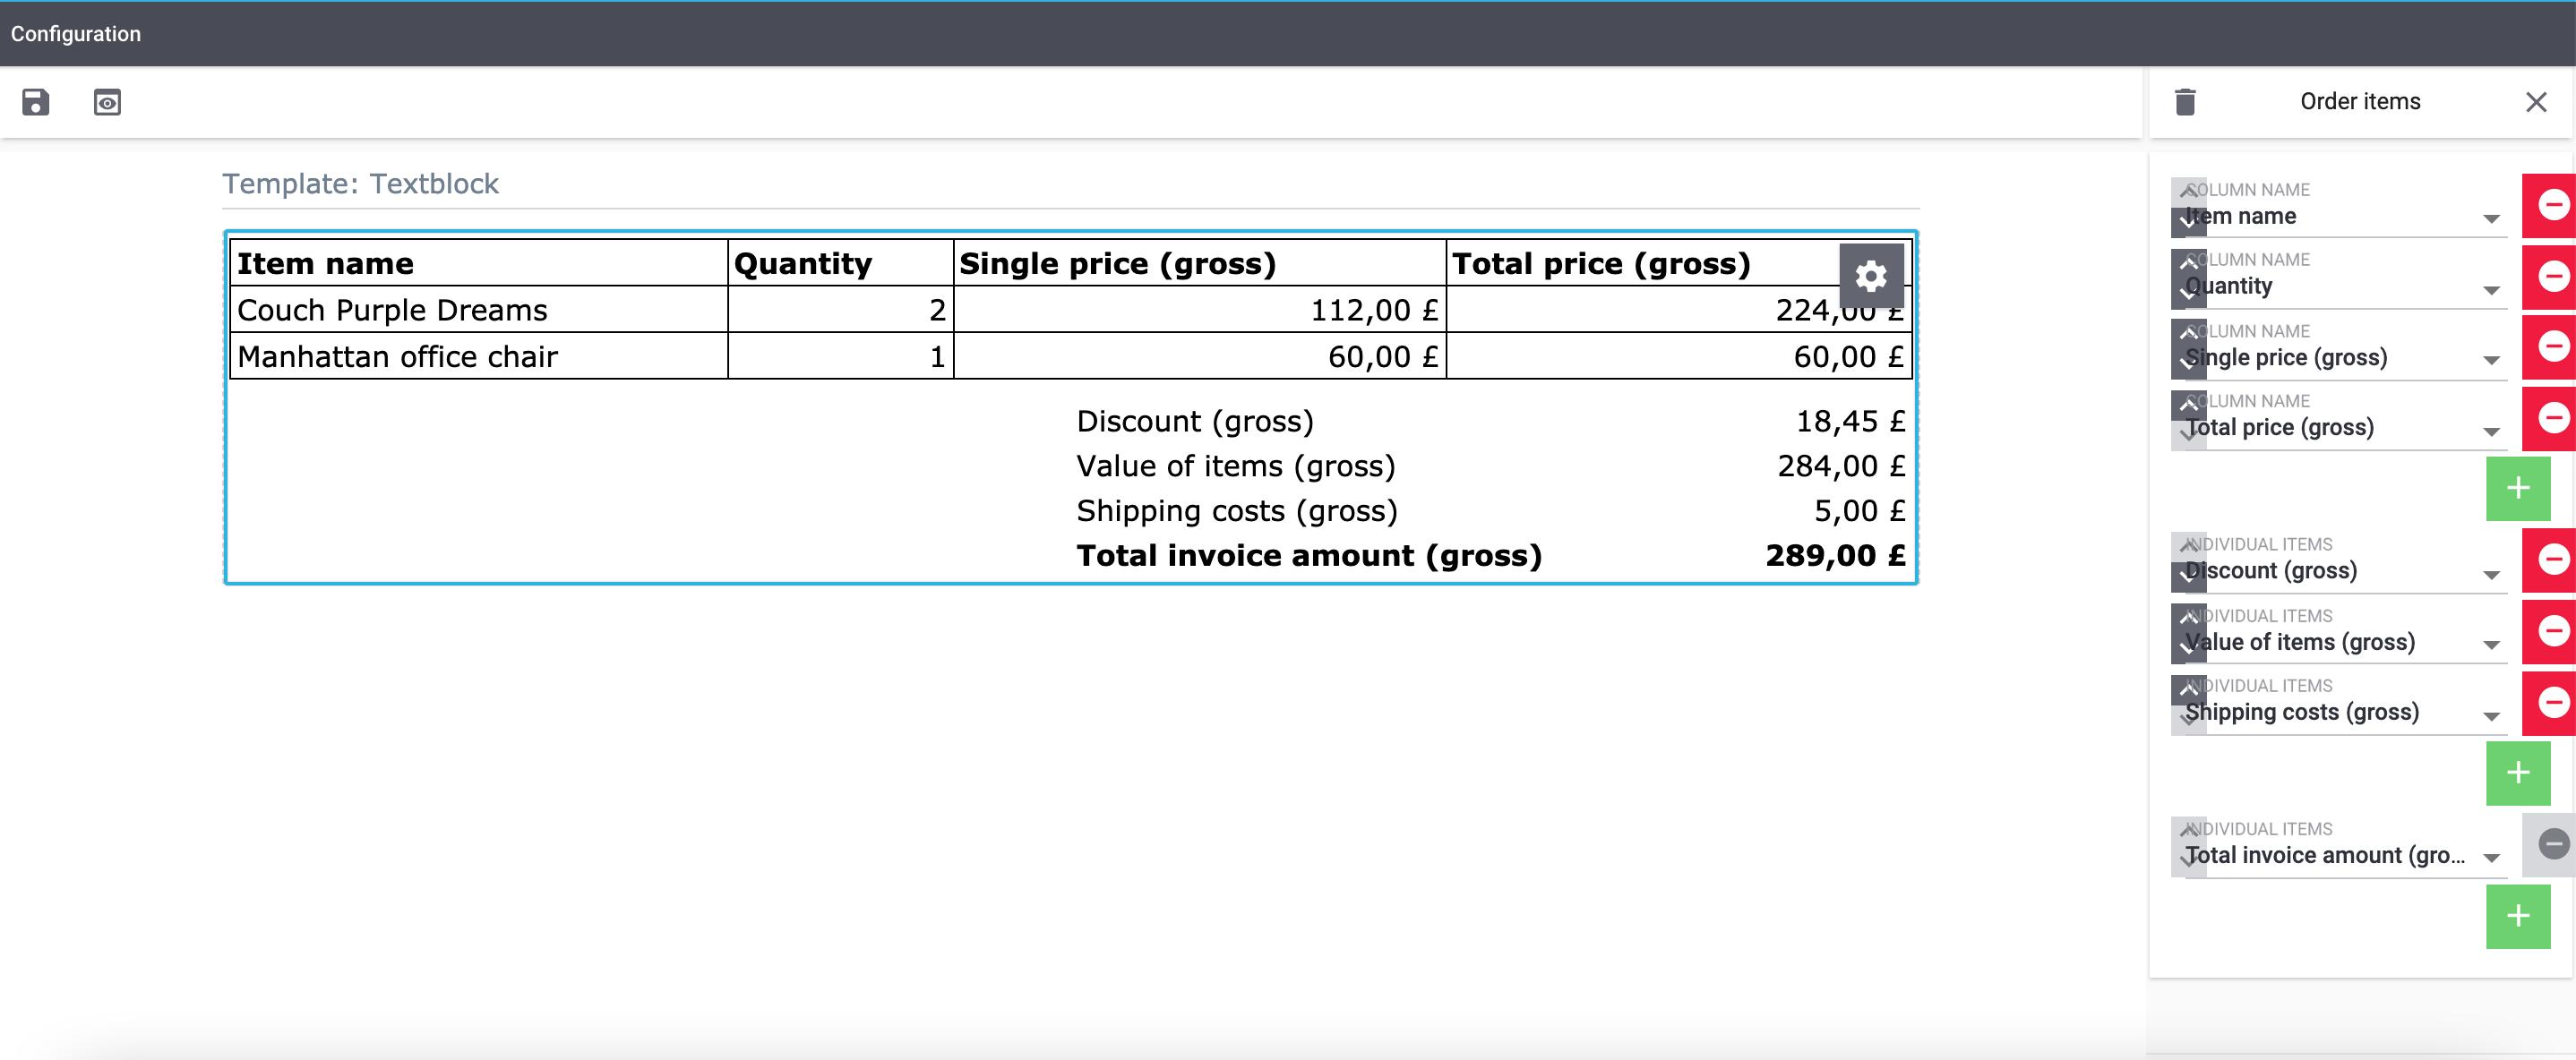 emailbuilder editing mode order items